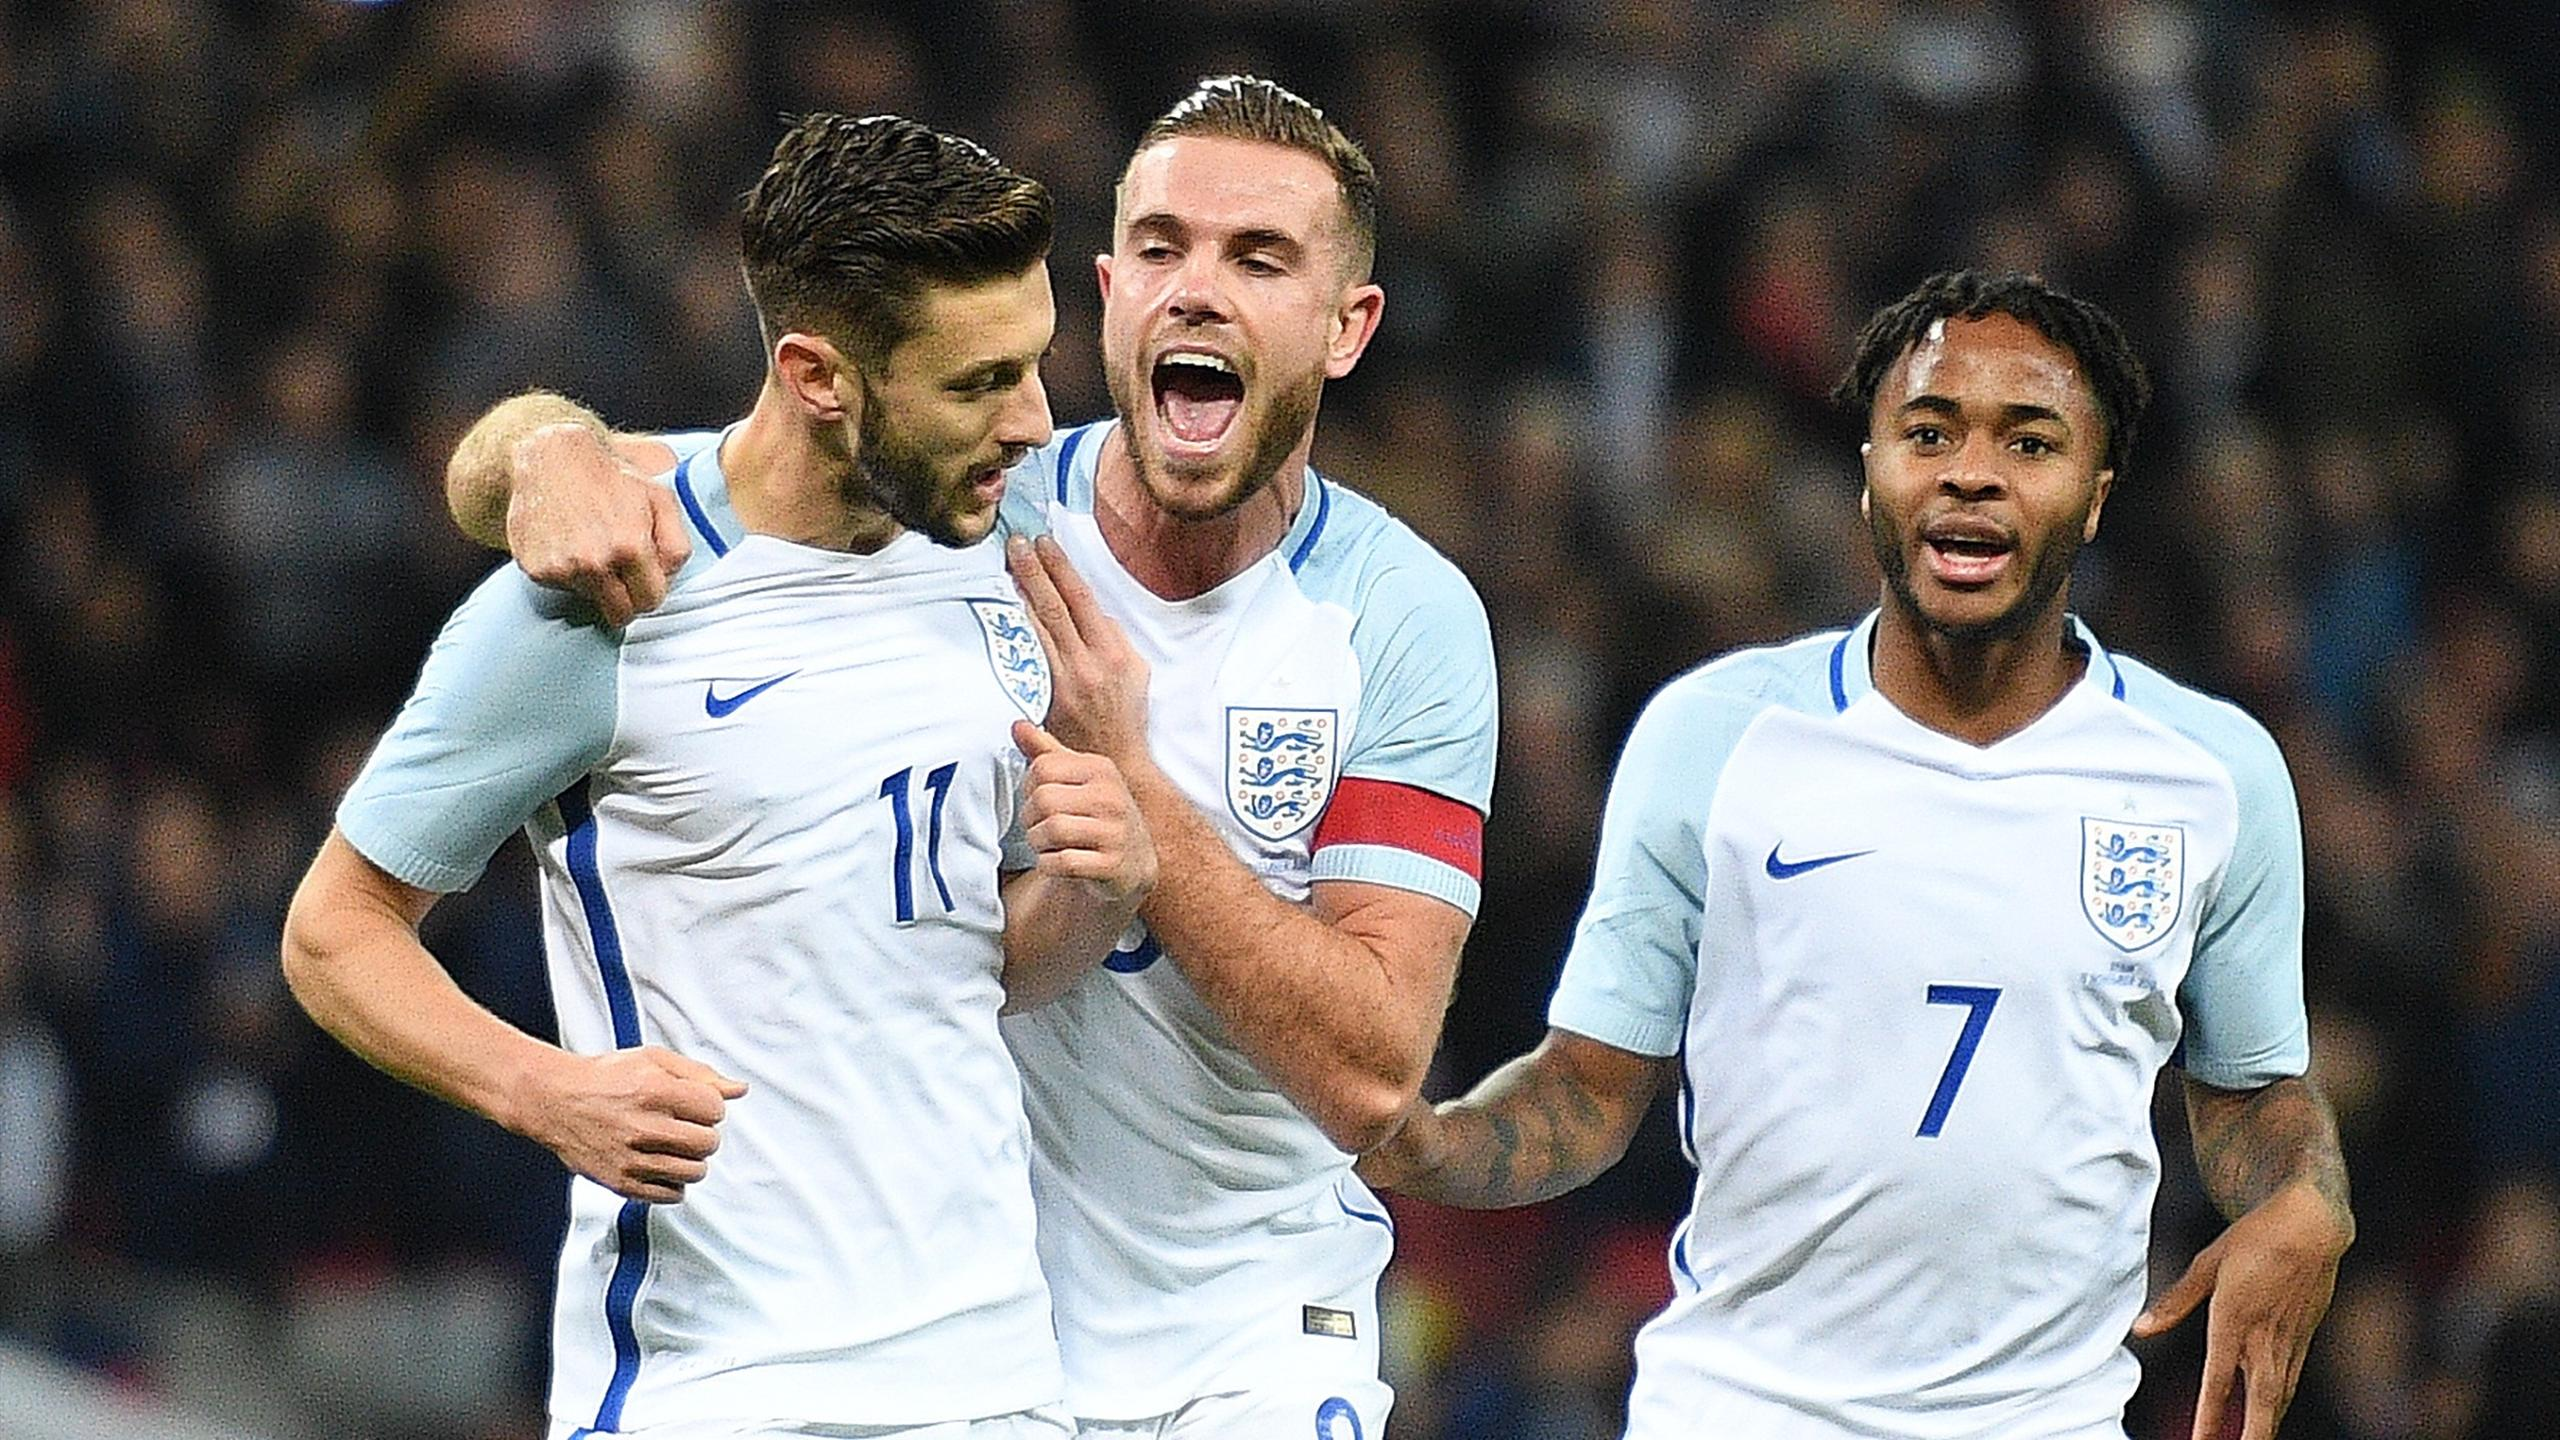 England's midfielder Adam Lallana (L) celebrates scoring his team's first goal from the penalty spot with England's midfielder Jordan Henderson (C) and England's midfielder Raheem Sterling